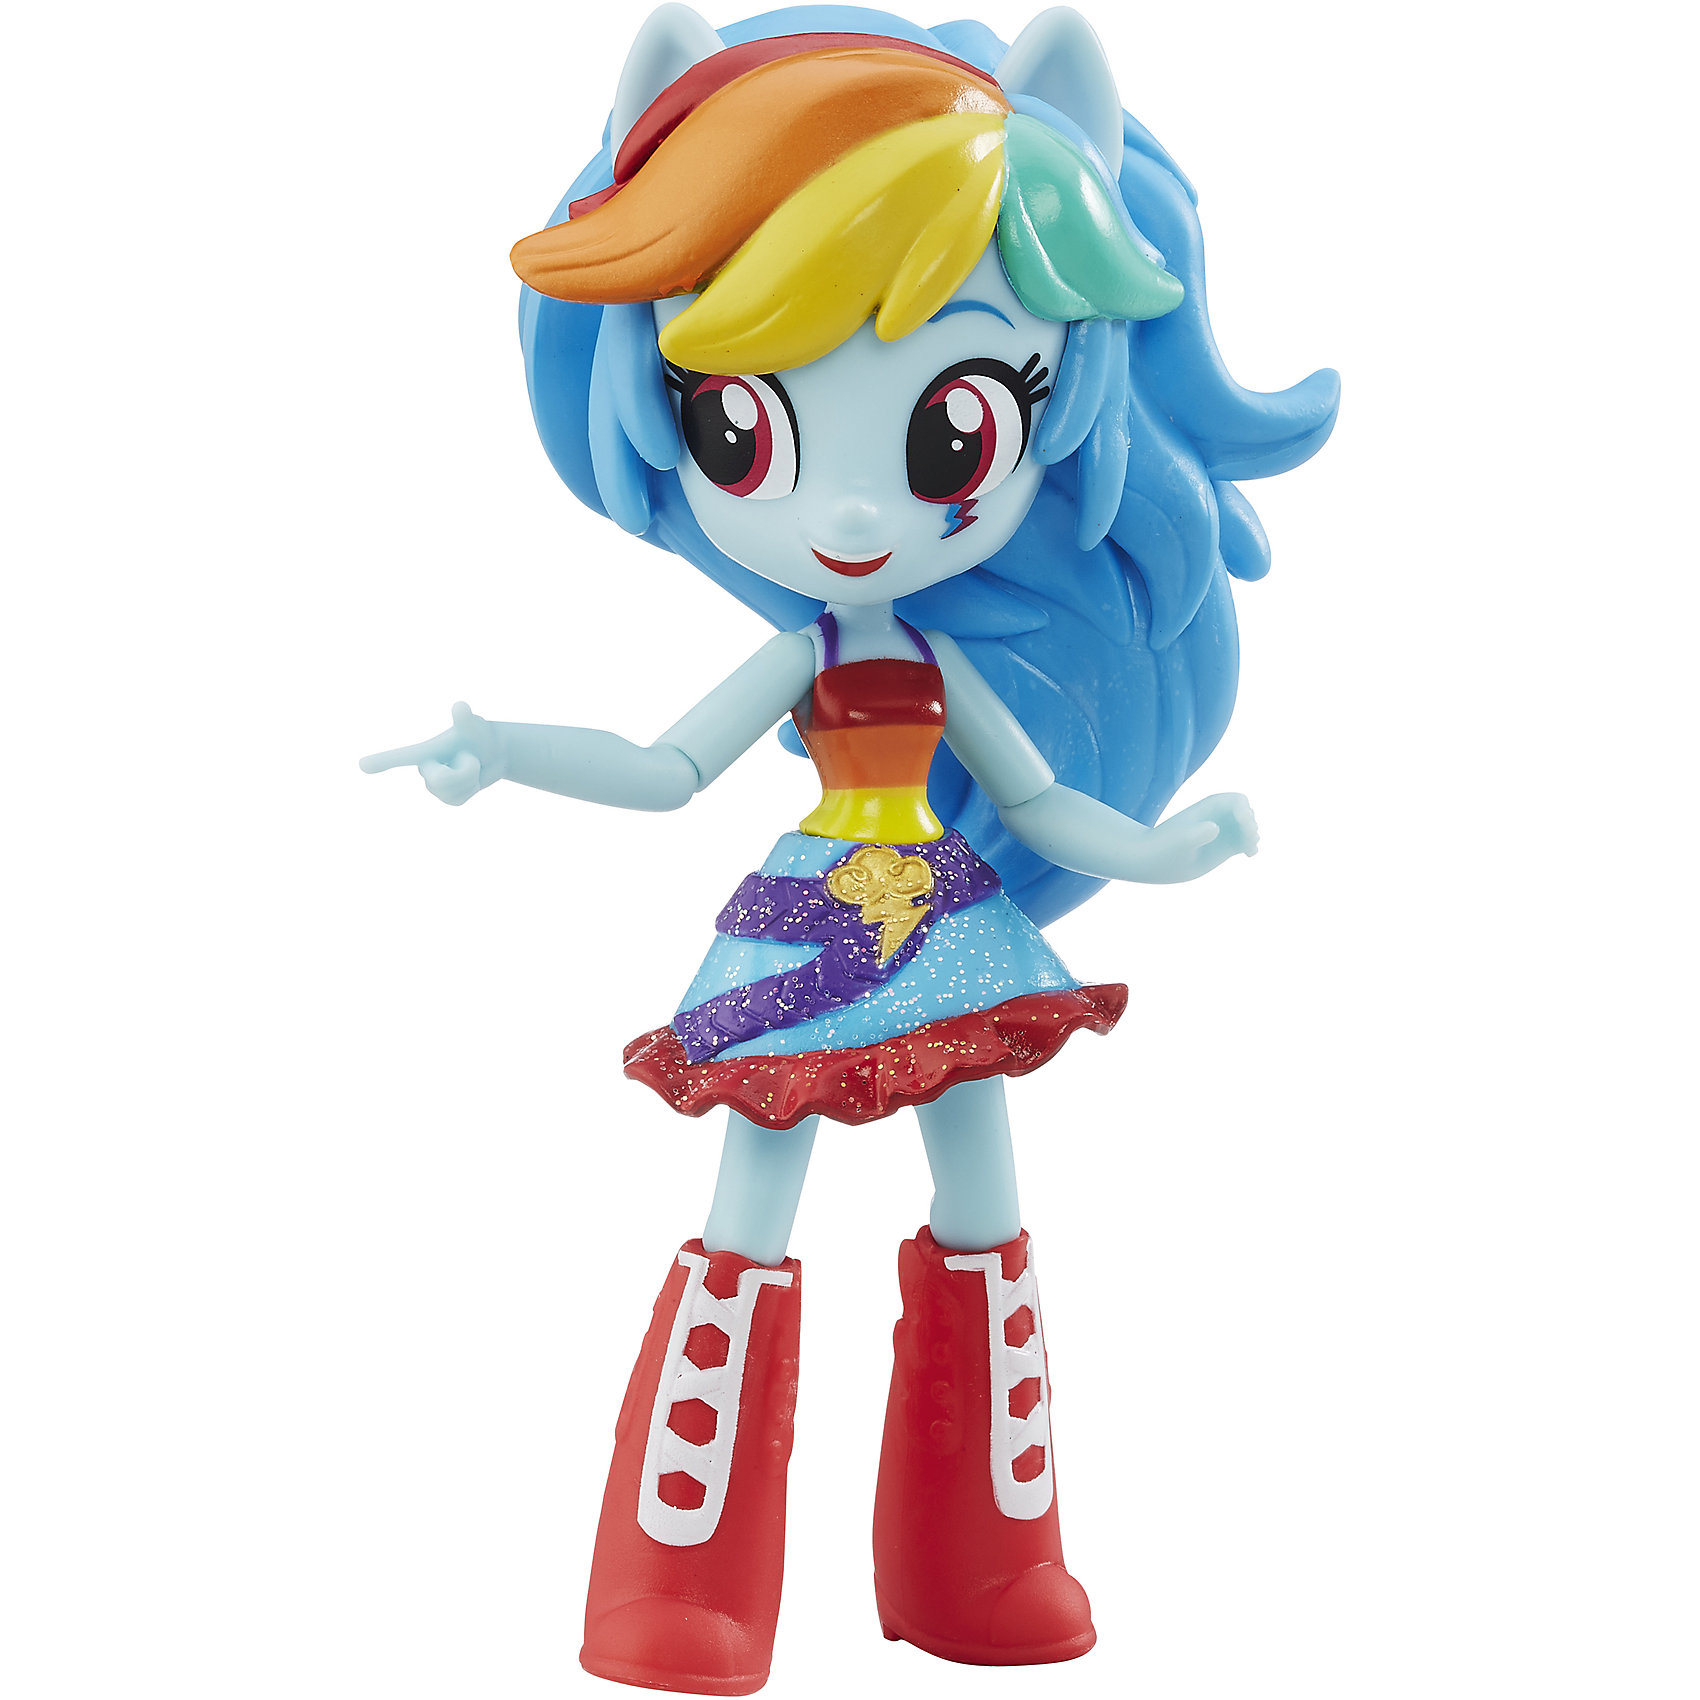 Hasbro Мини-кукла Радуга Дэш, Эквестрия герлз, B4903/B7786  hasbro мини кукла эквестрия герлз b4903 b7793